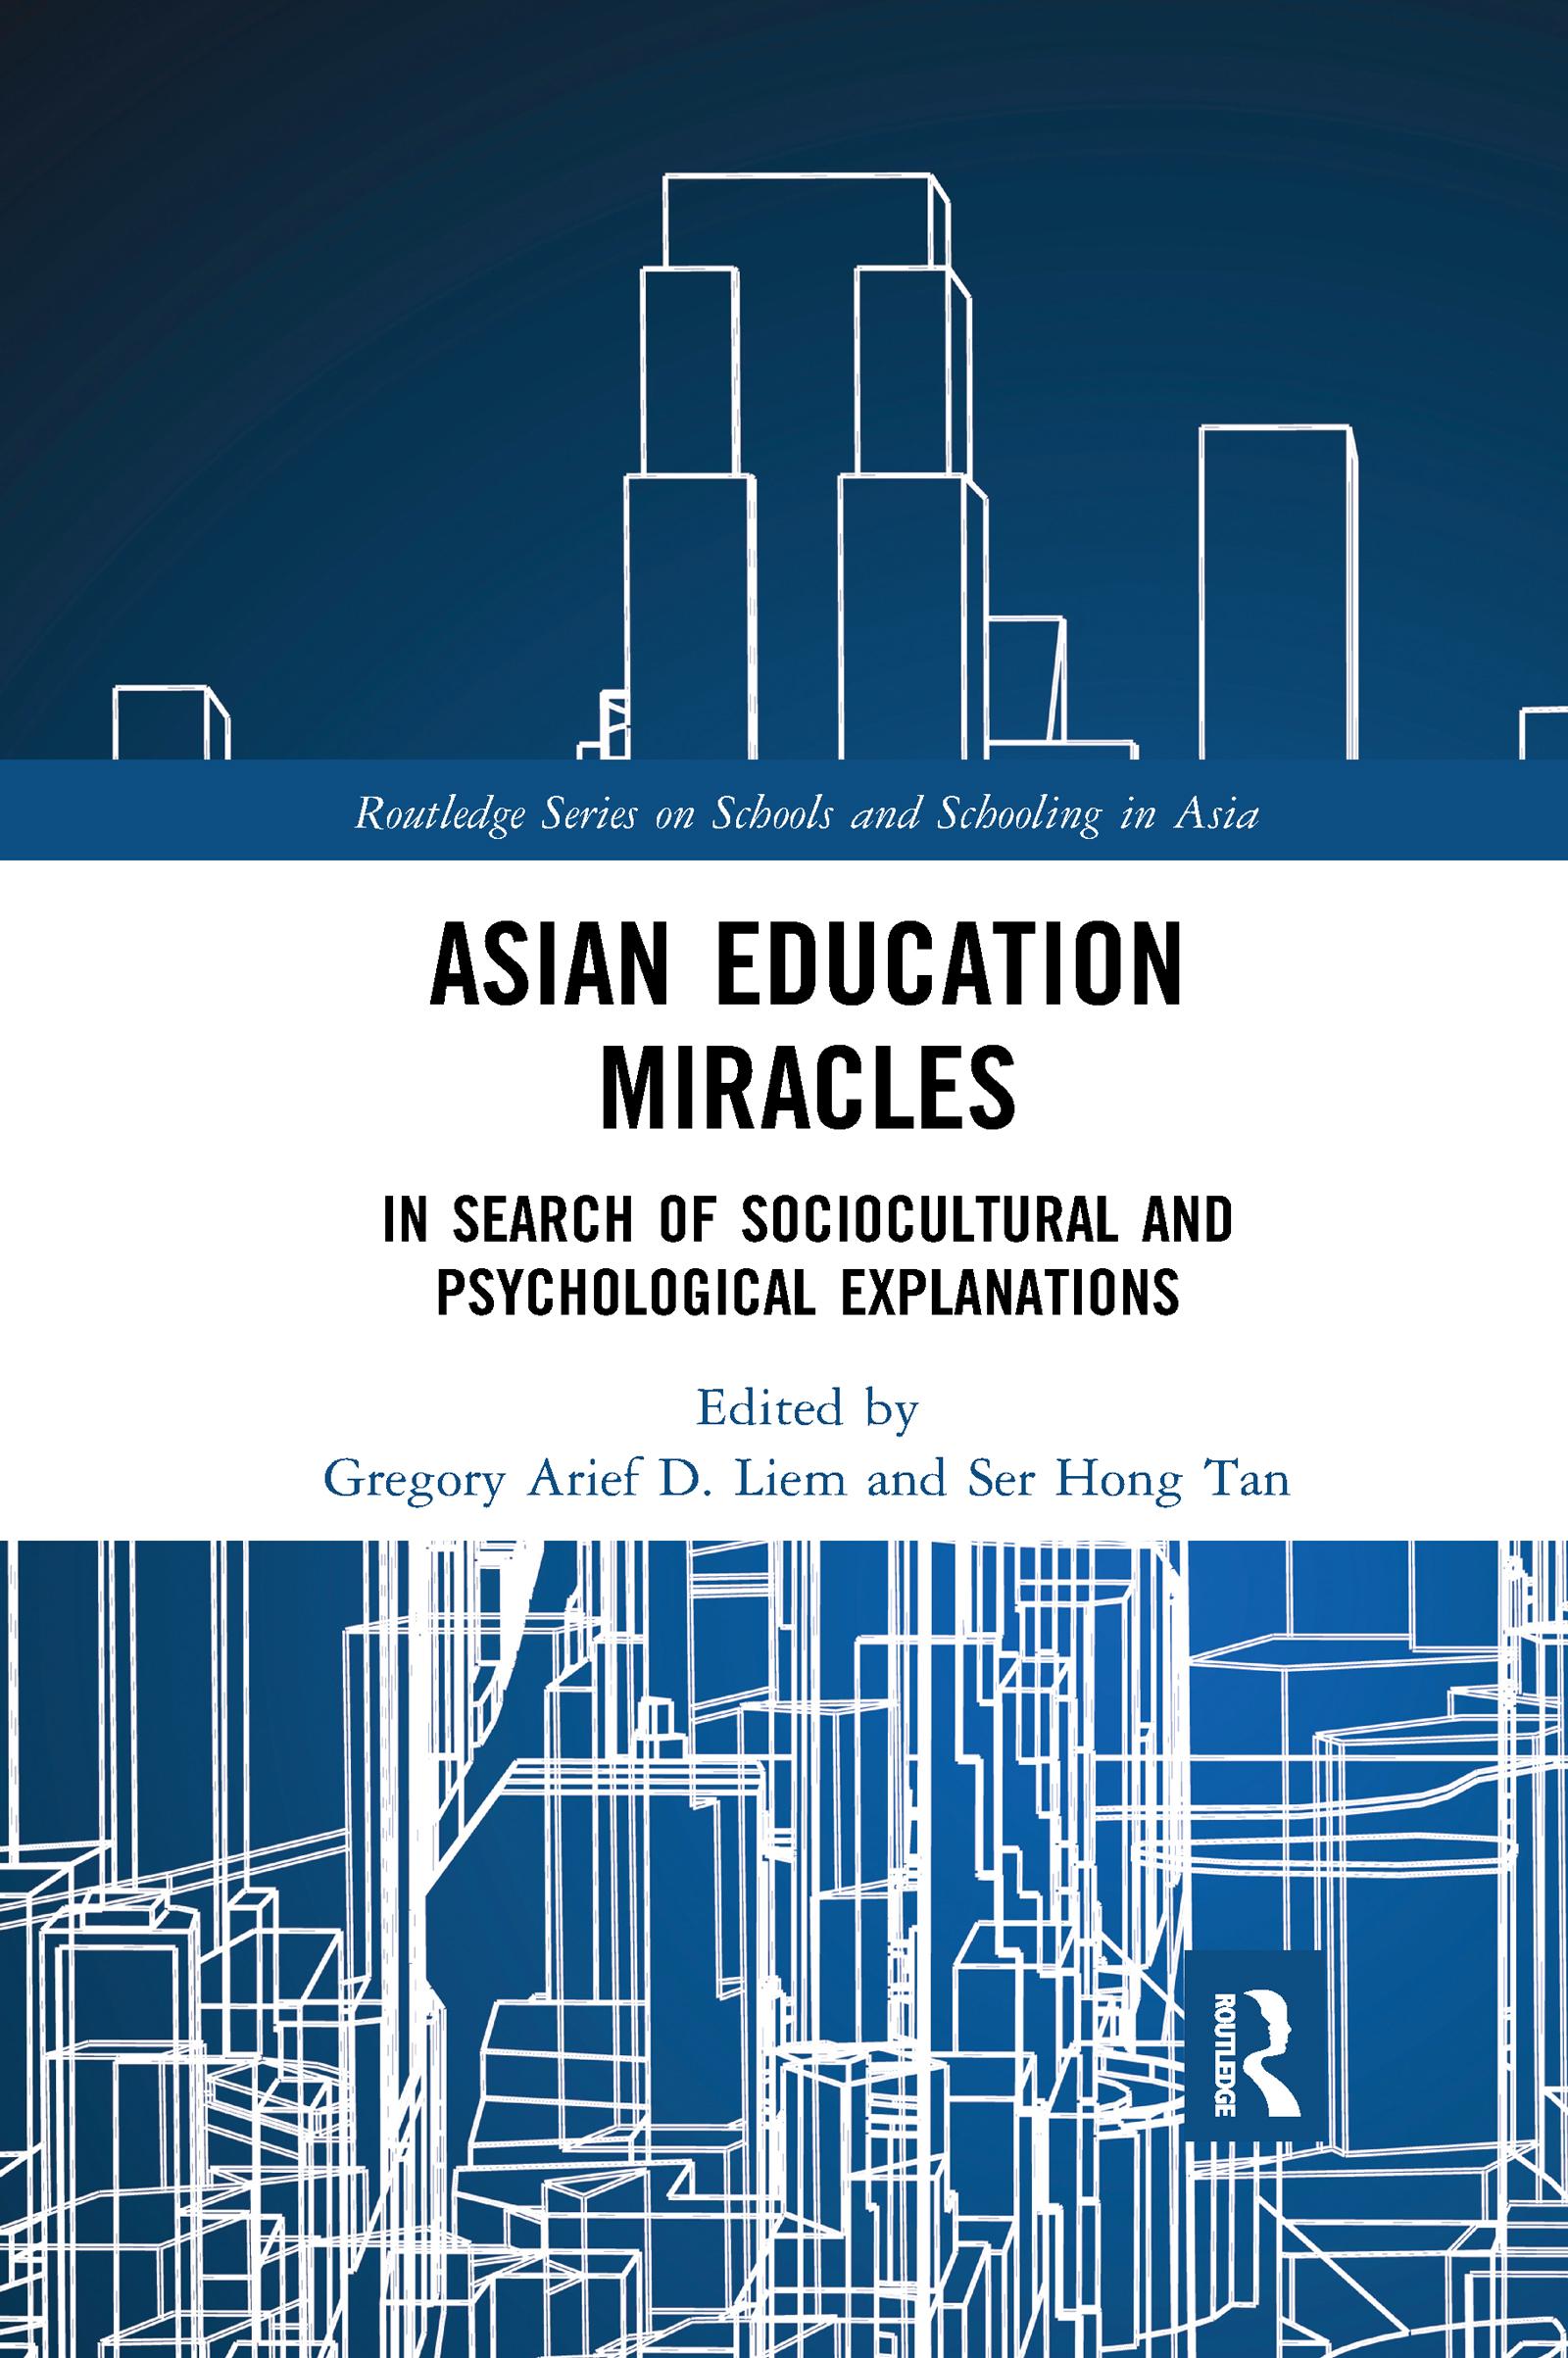 Asian Education Miracles